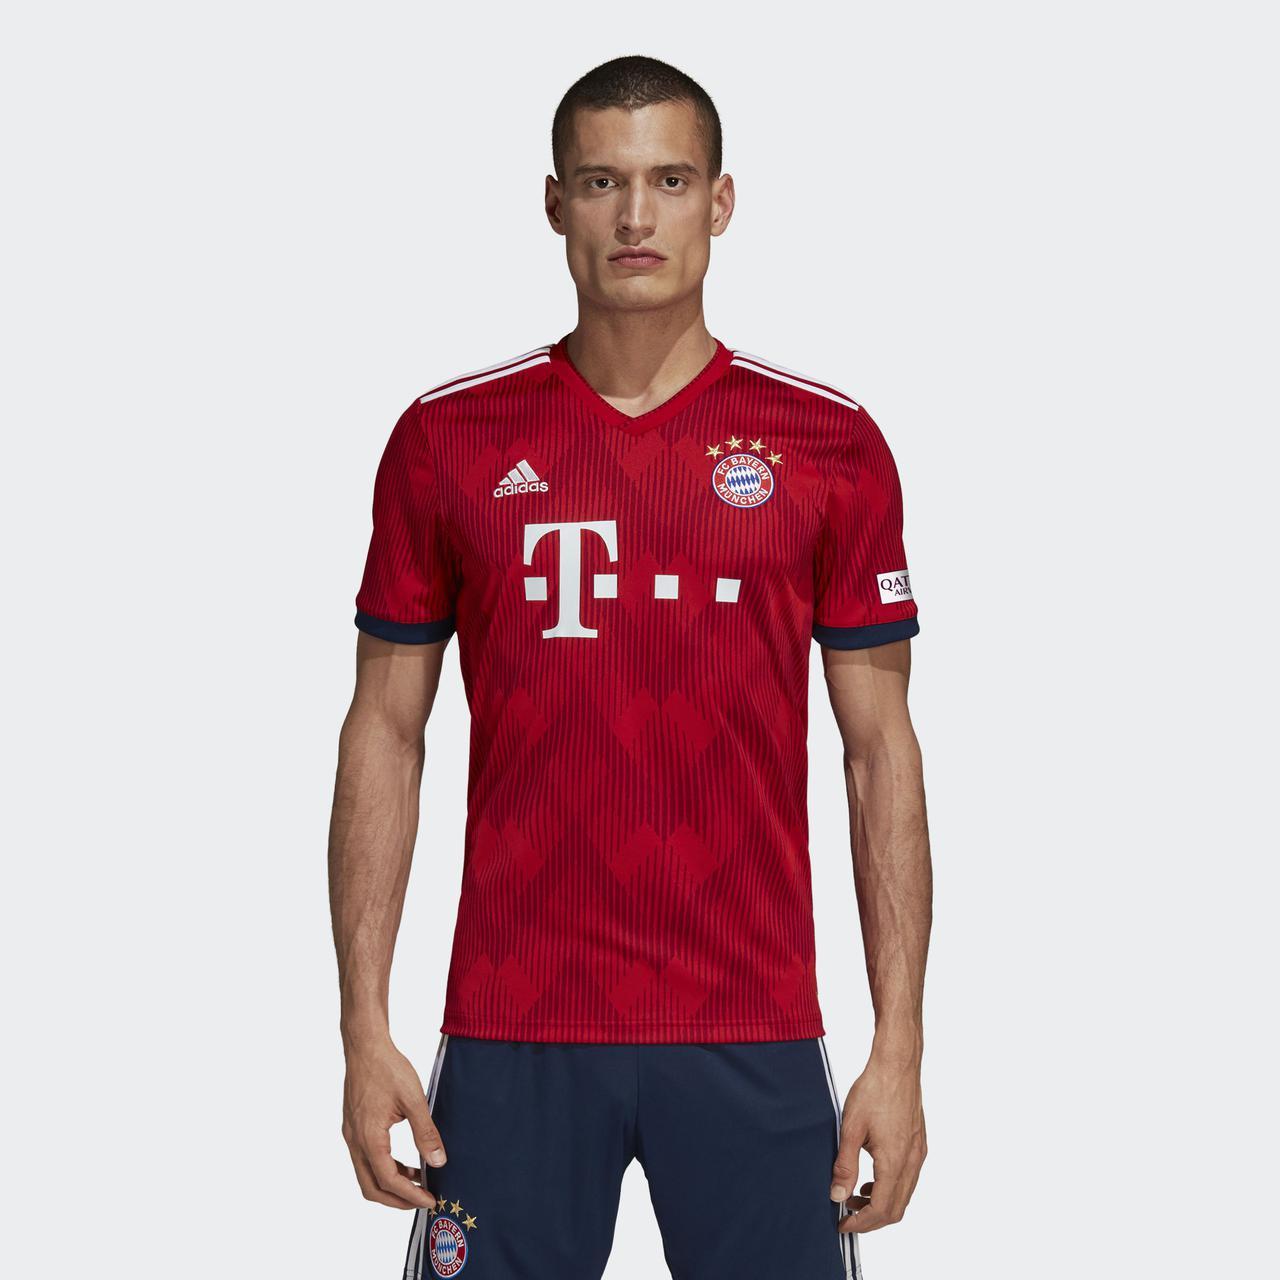 Домашняя игровая футболка Бавария Мюнхен, фото 1